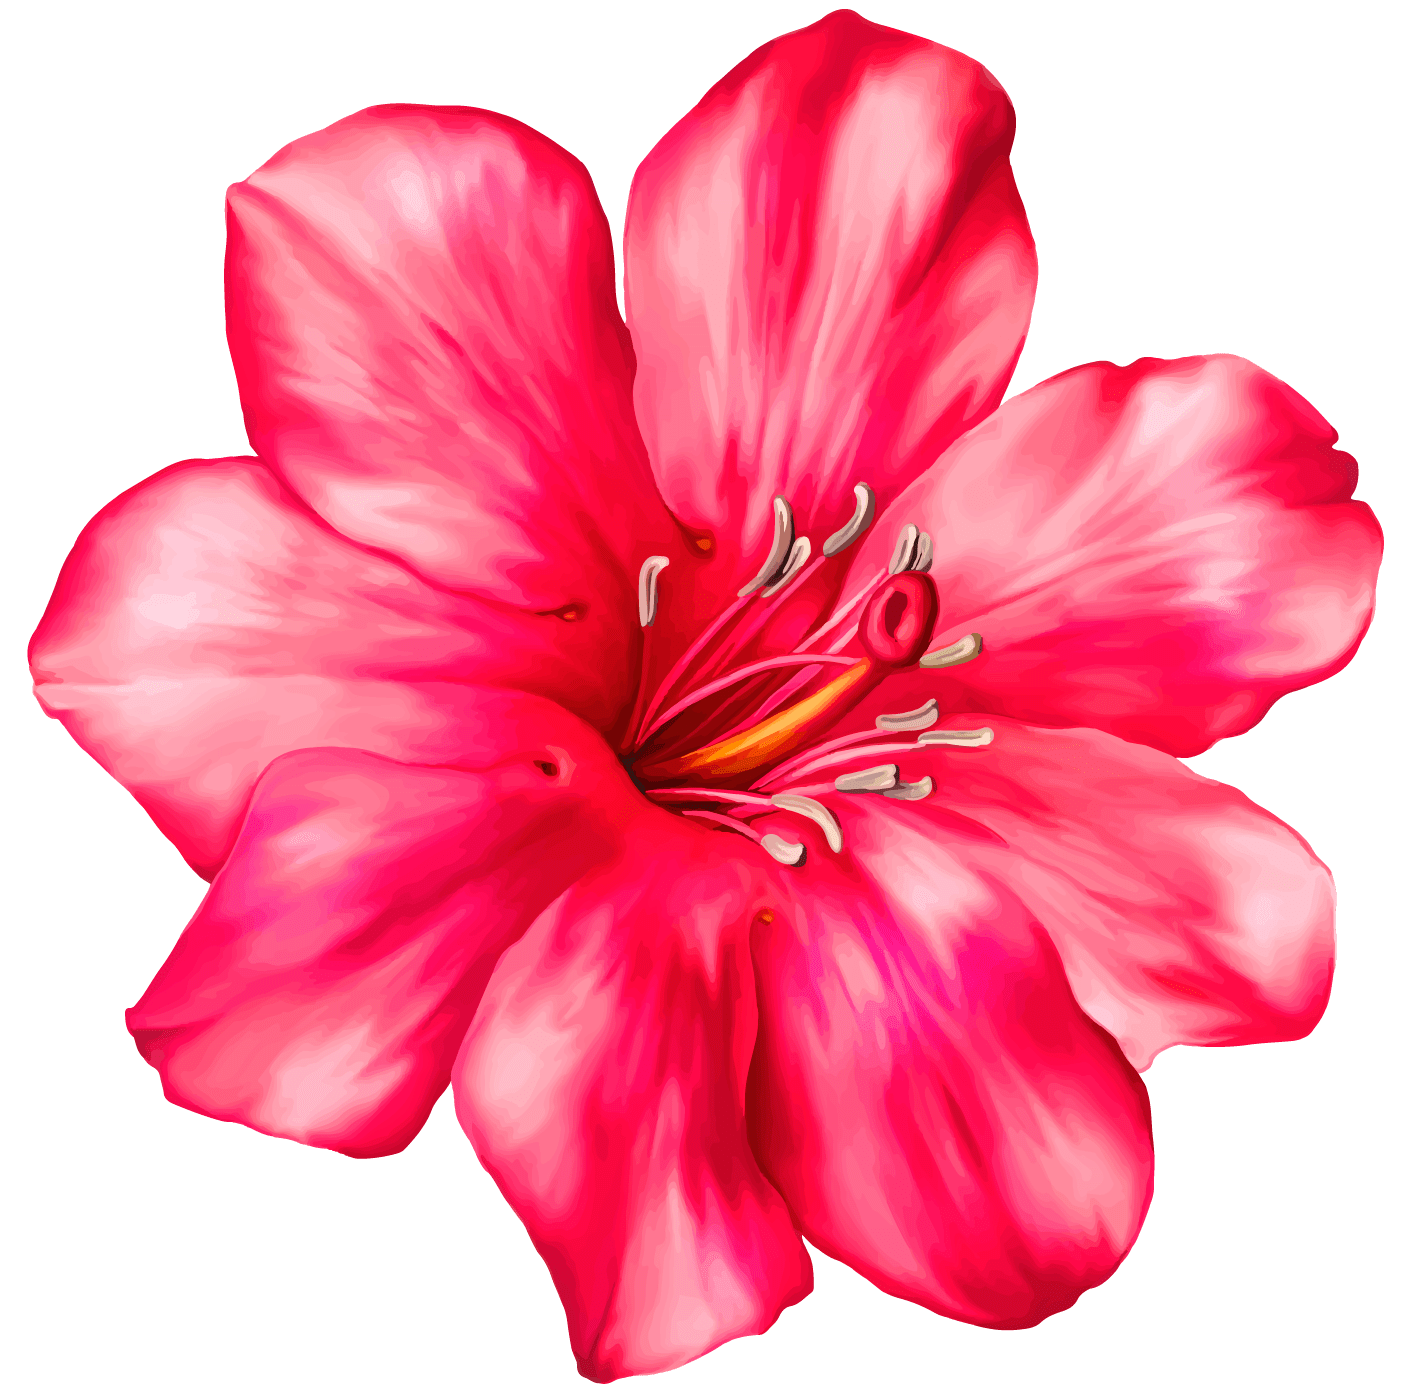 Moana flower clipart 4 » Clipart Portal.